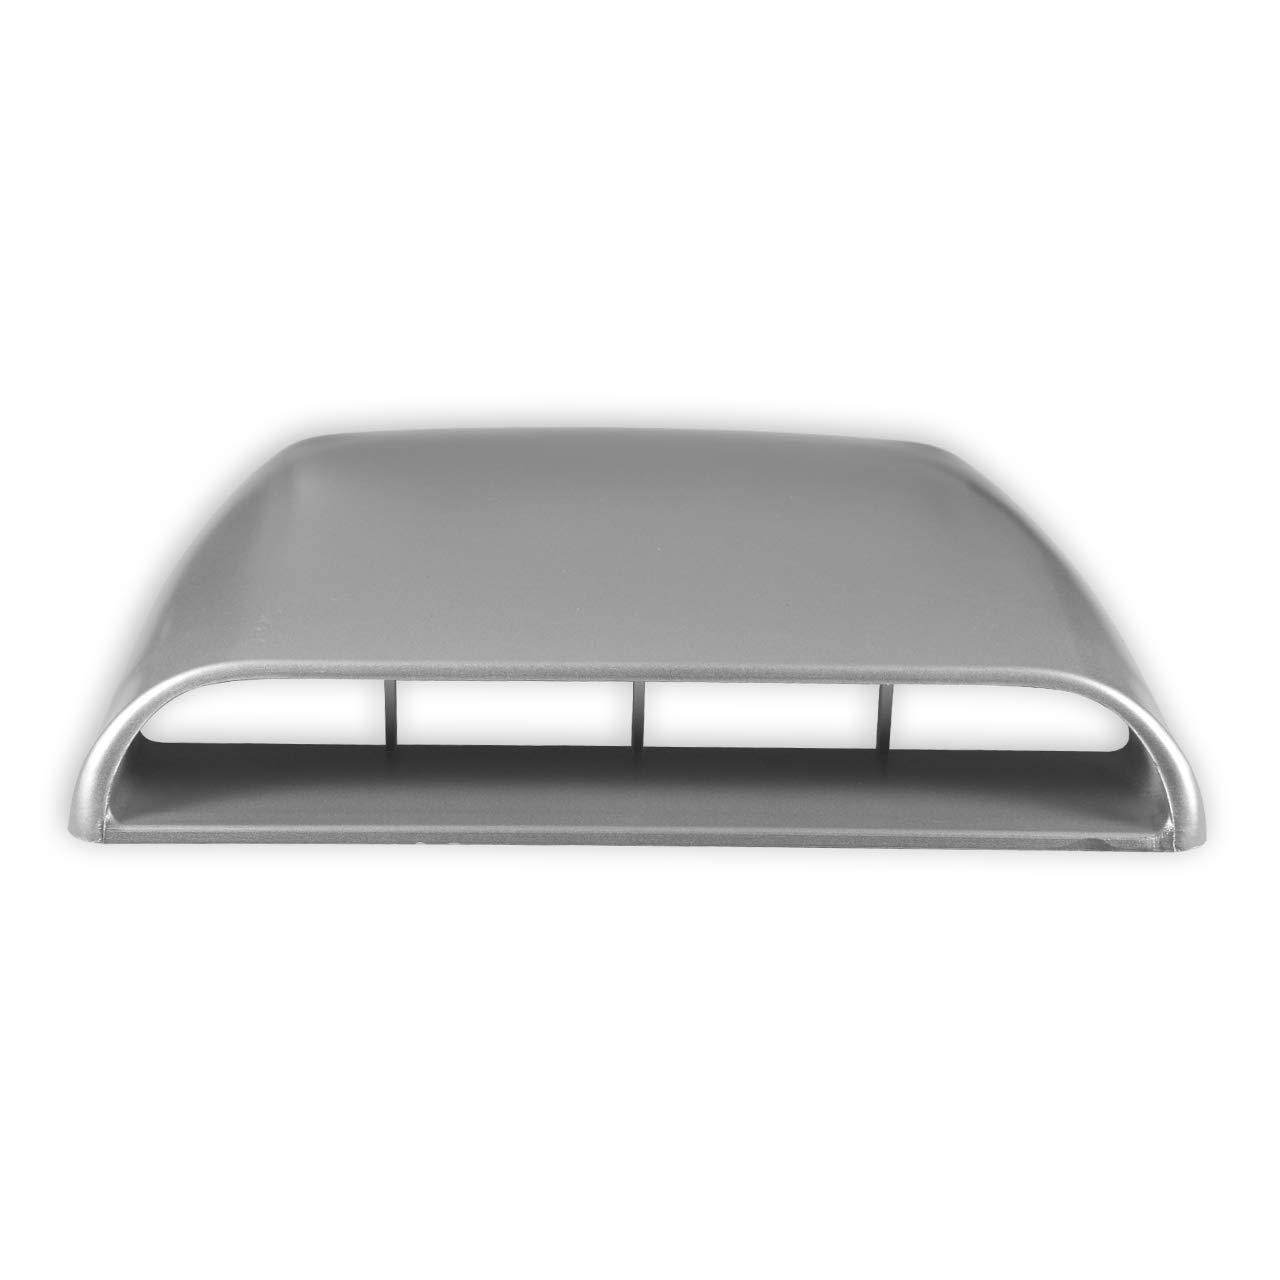 NATGIC Car Air Flow Vent Cover Universal Car Decorative Air Flow Intake Hood Scoop Bonnet Vent Sticker Cover Hood Carbon Fiber